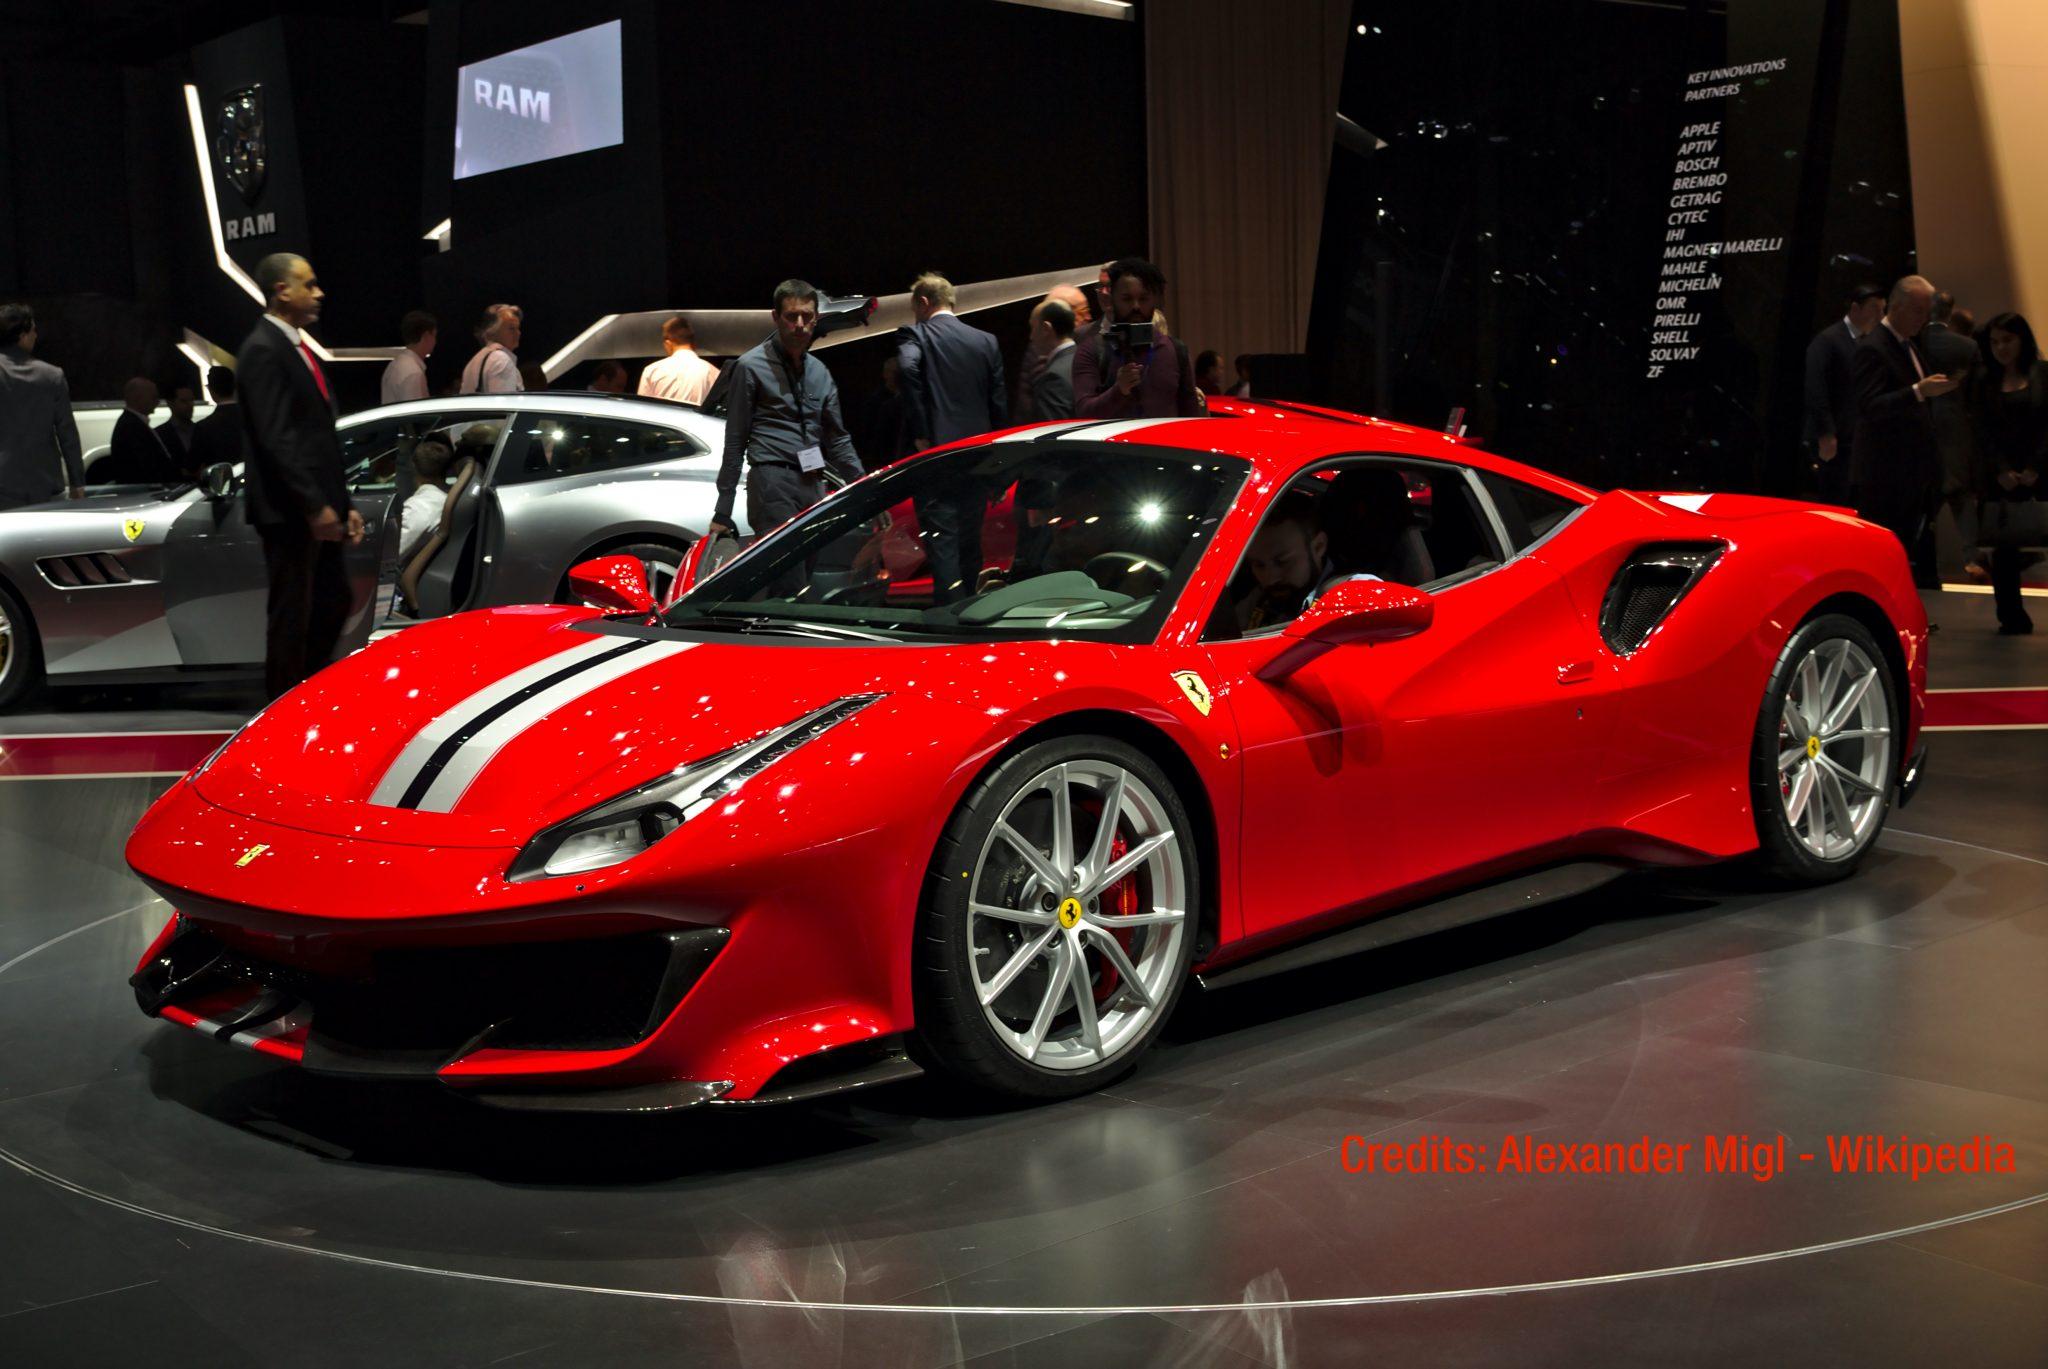 Ferrari 488 Pista - Power Service Luxury Car Hire